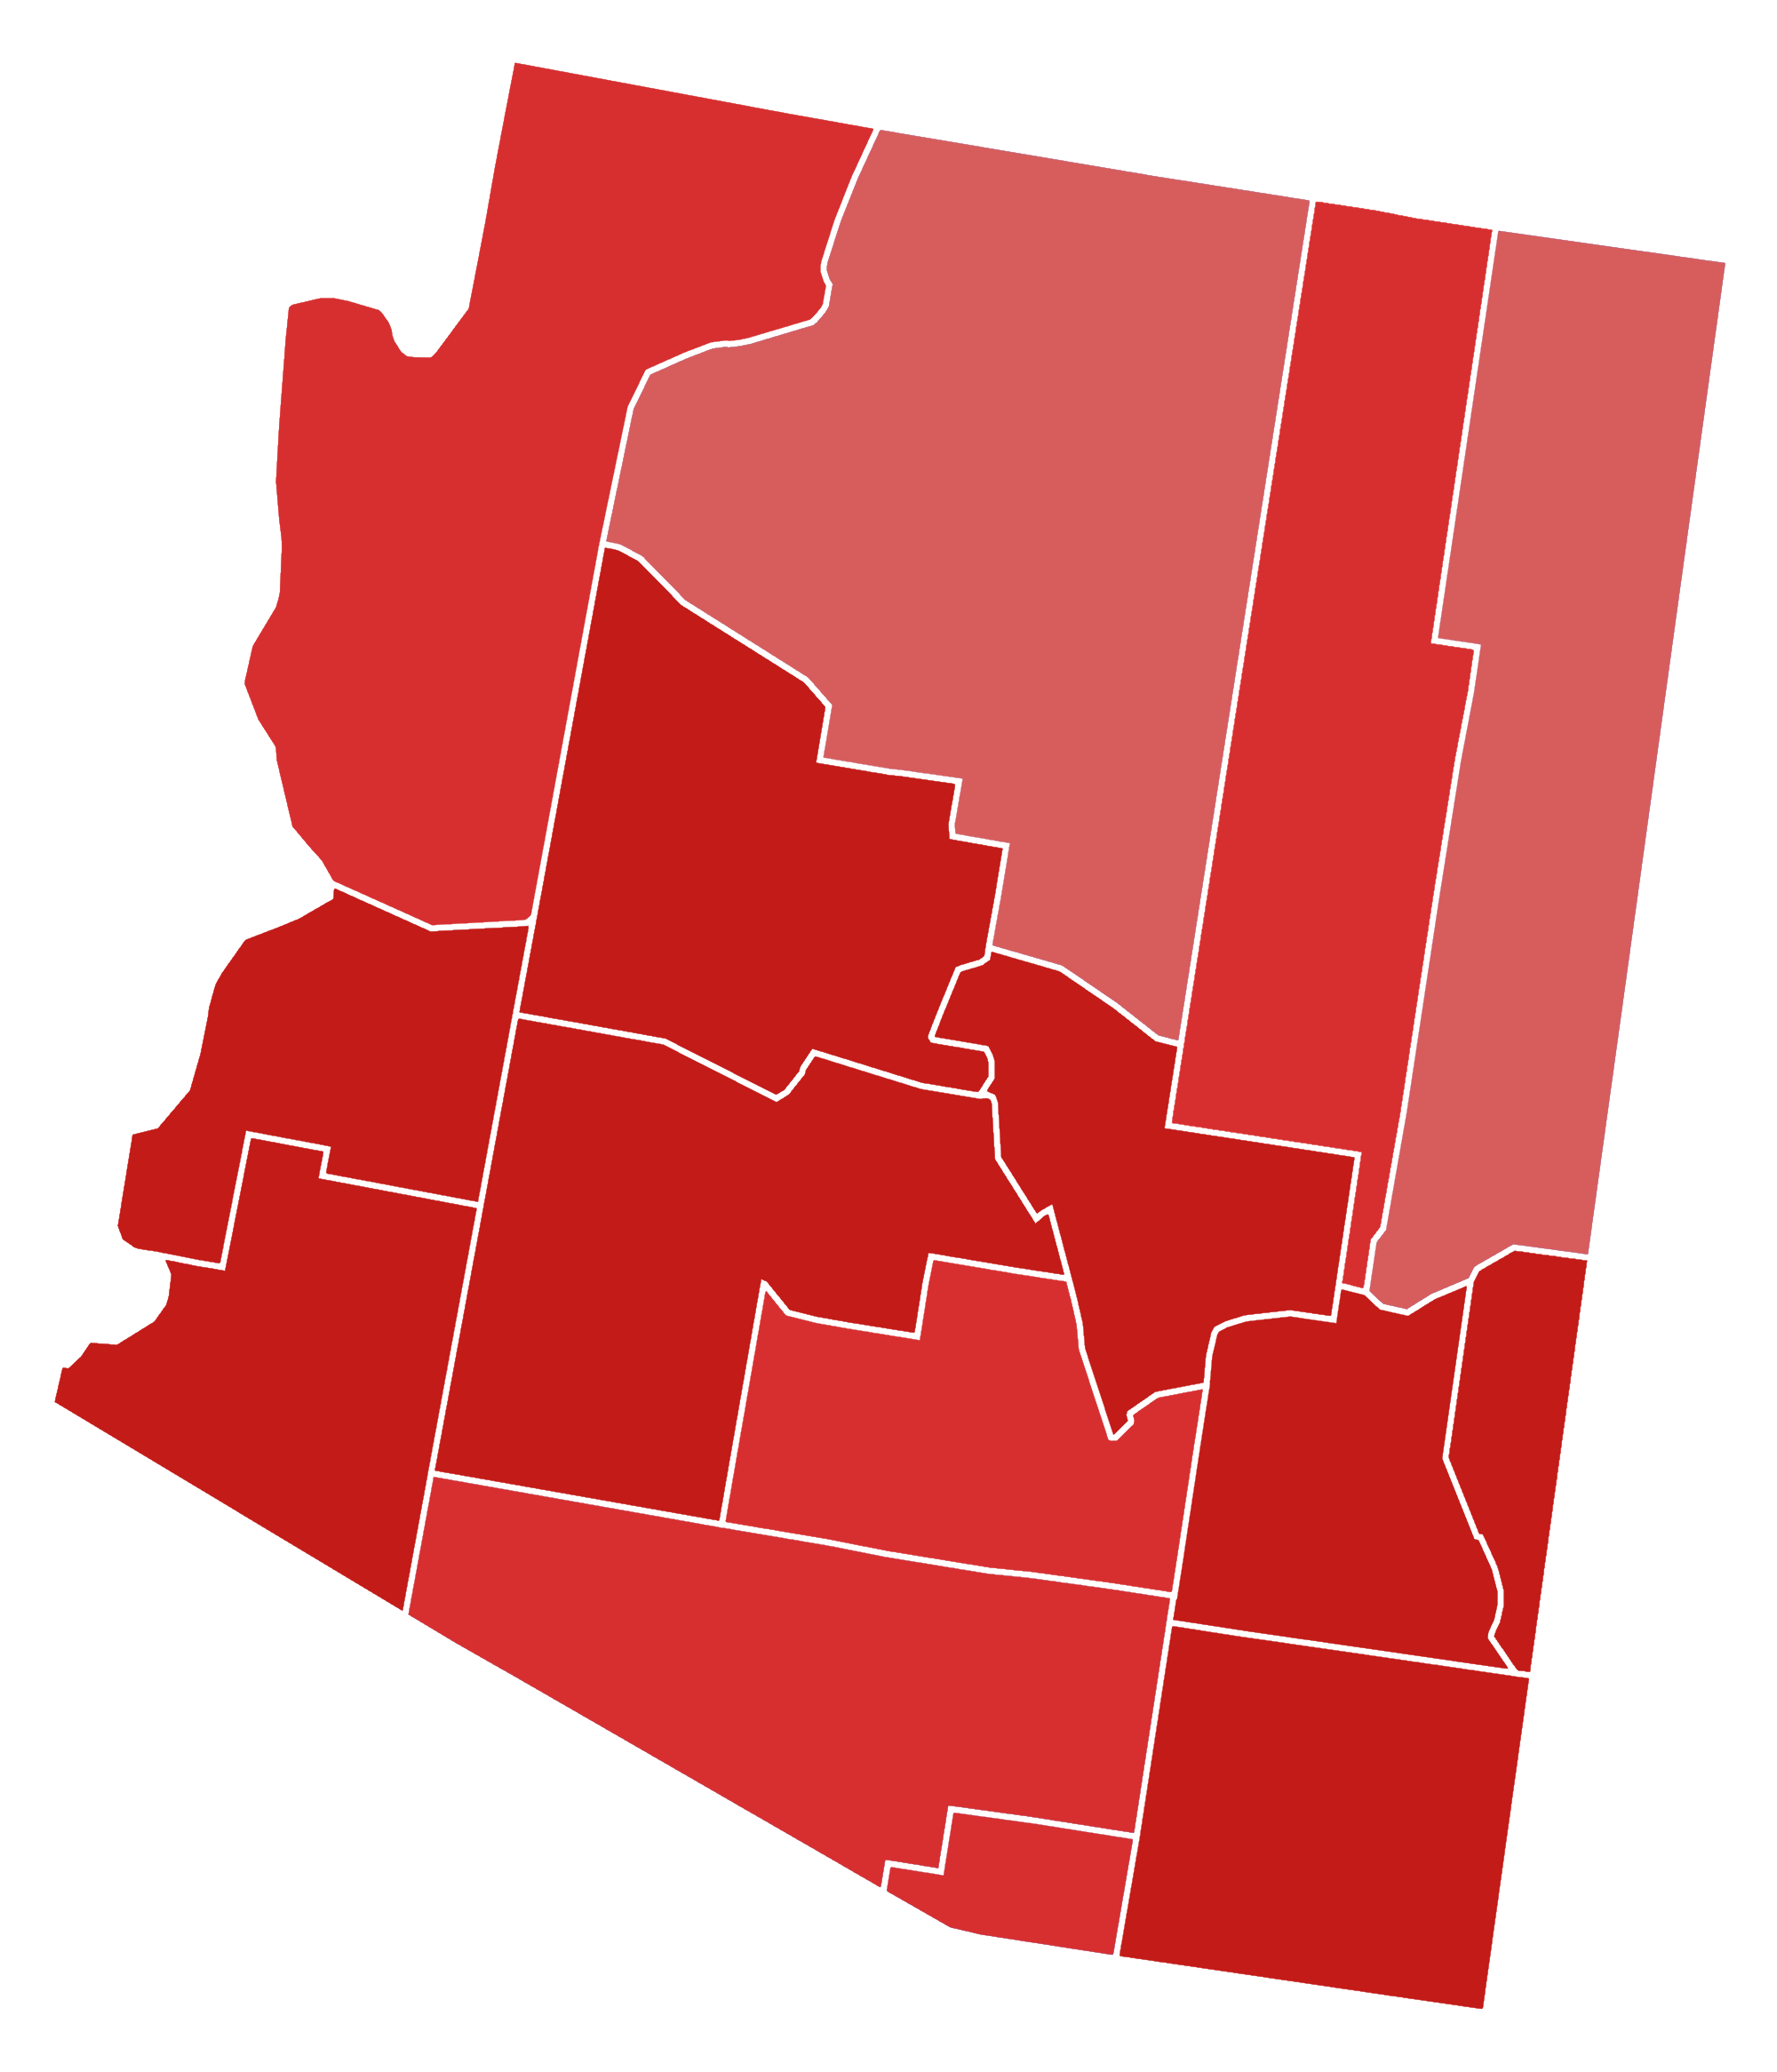 File:2000 Arizona.png.